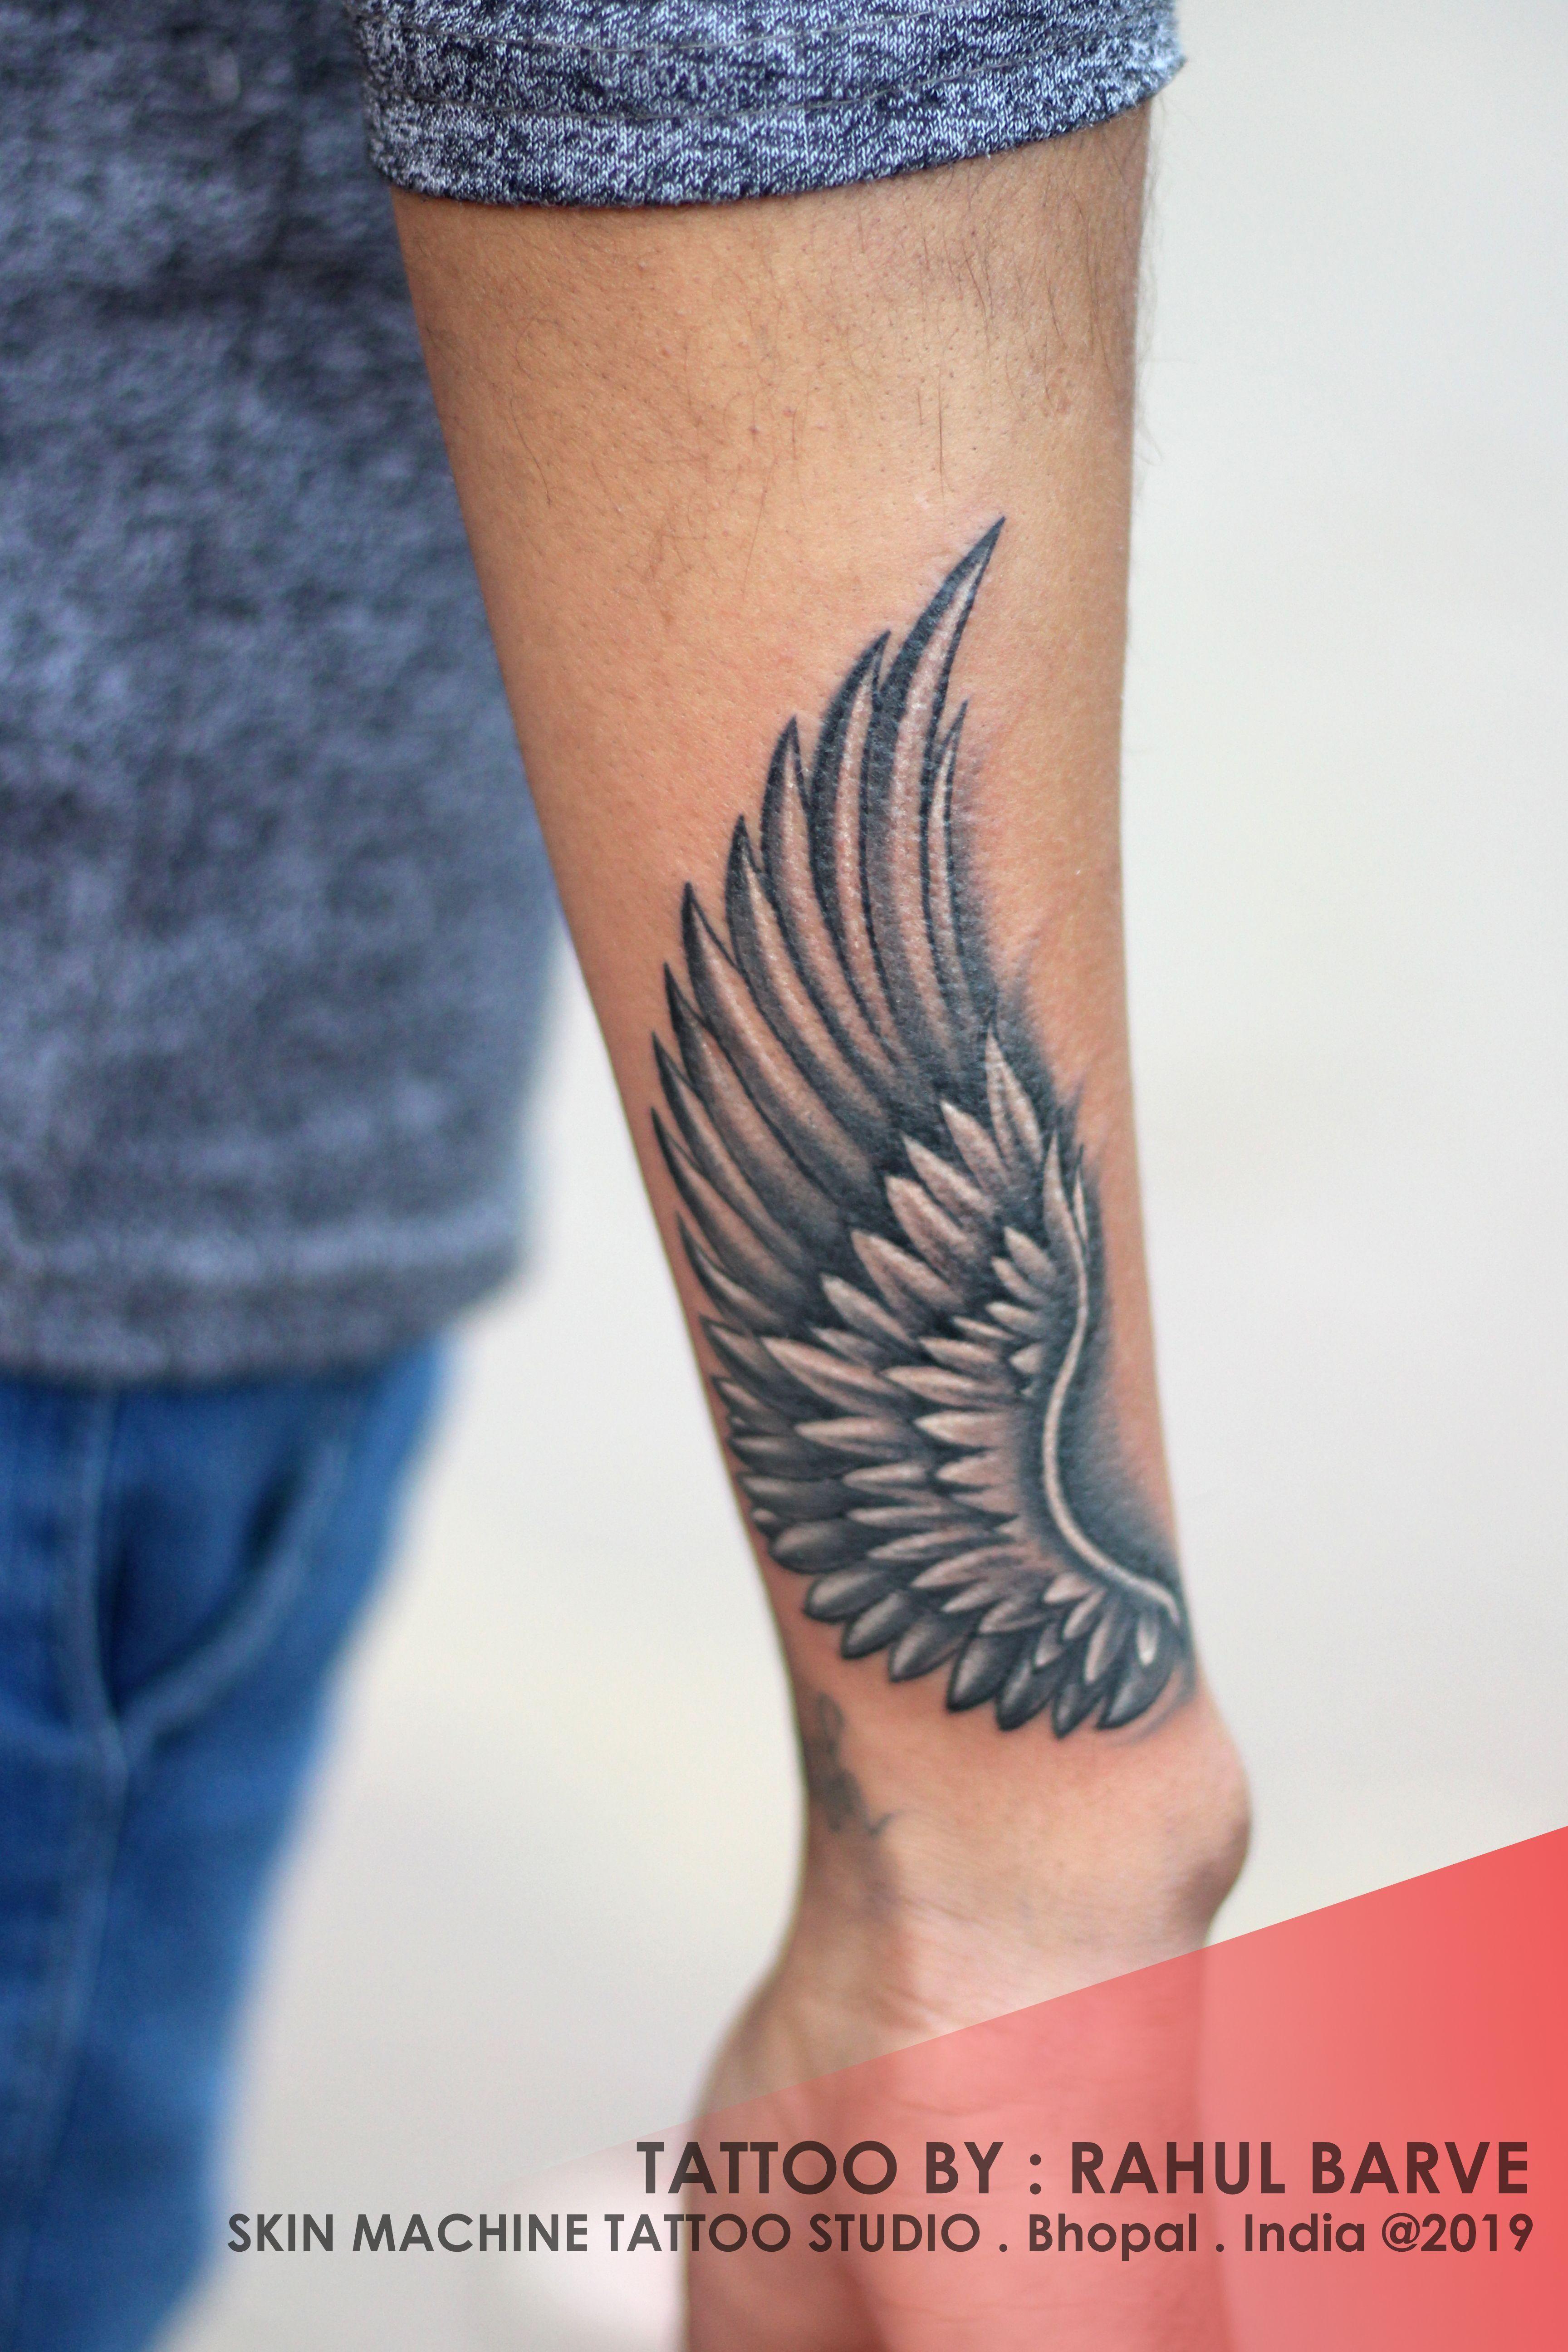 Tattoo Studio Promo Video Corto De Skin Machine Tattoo Studio Aakash Chandani In 2020 Wings Tattoo Wrist Tattoos For Guys Wing Tattoo Men